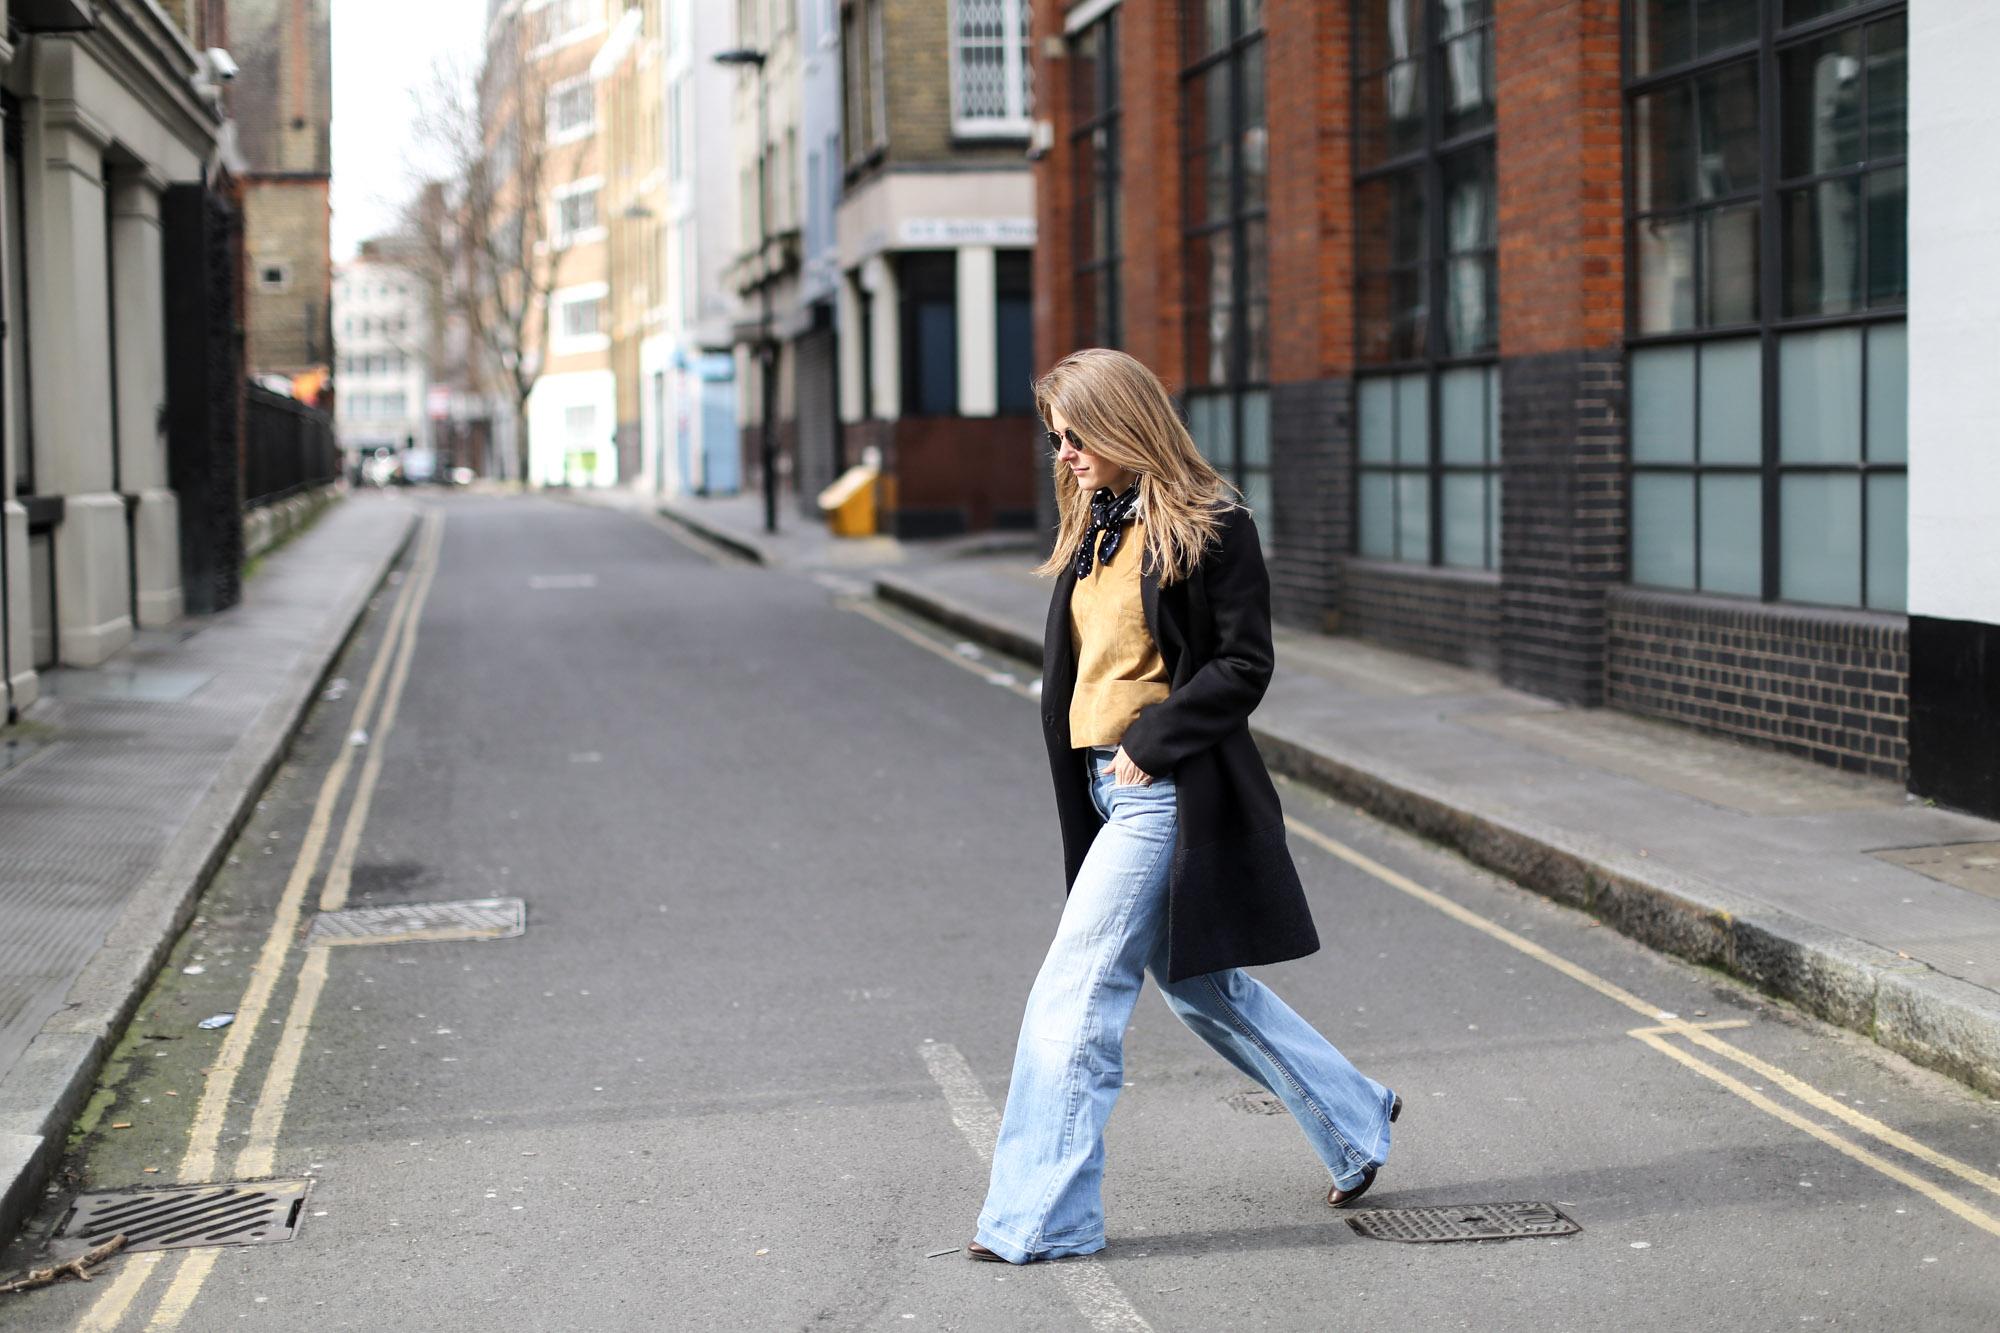 Clochet-wide-retro-jeans-suede-top-cos-coat-5